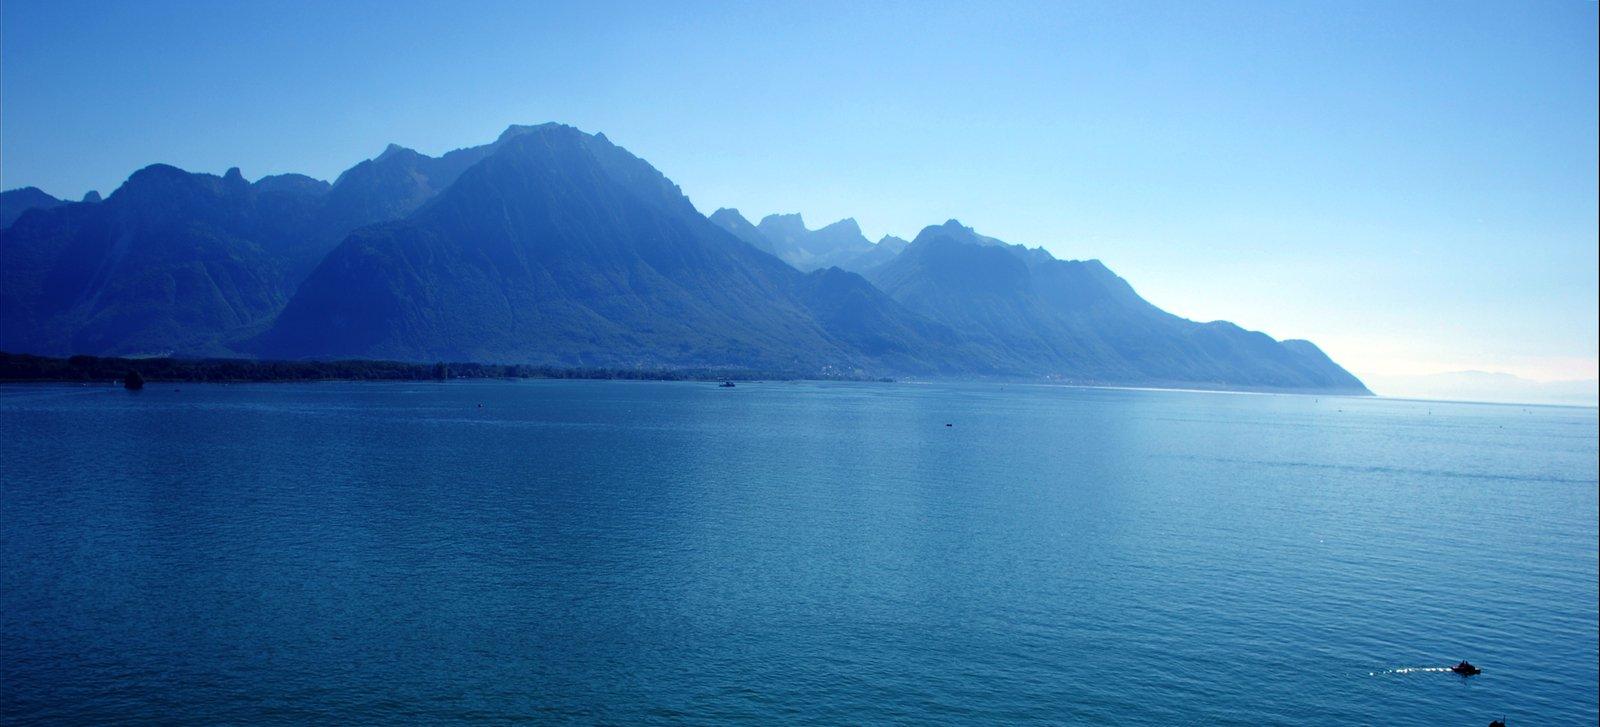 mountains-1364006.jpg